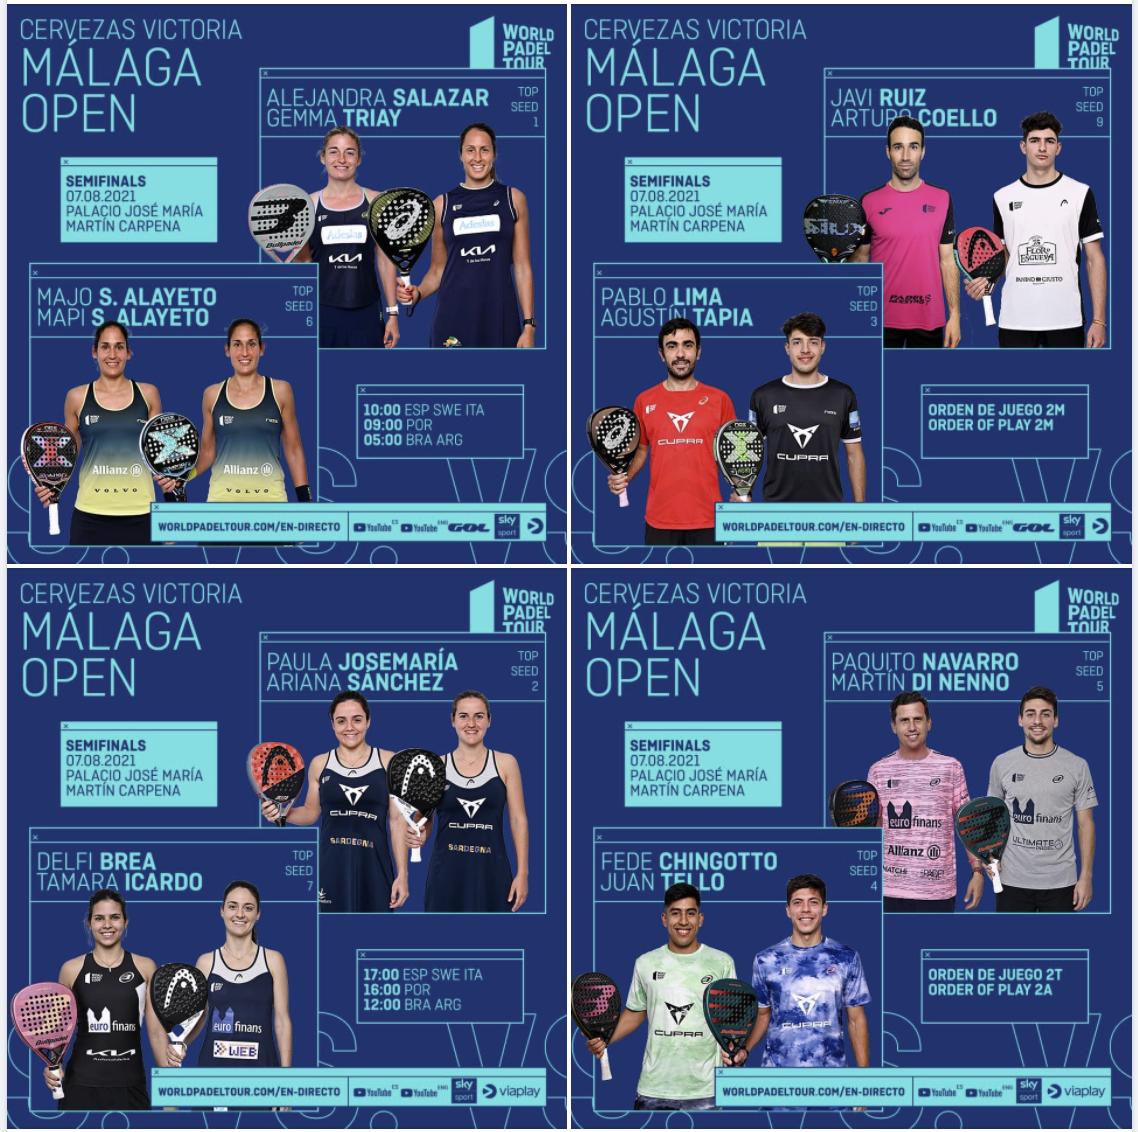 World padel tour demi-finale malaga 2021